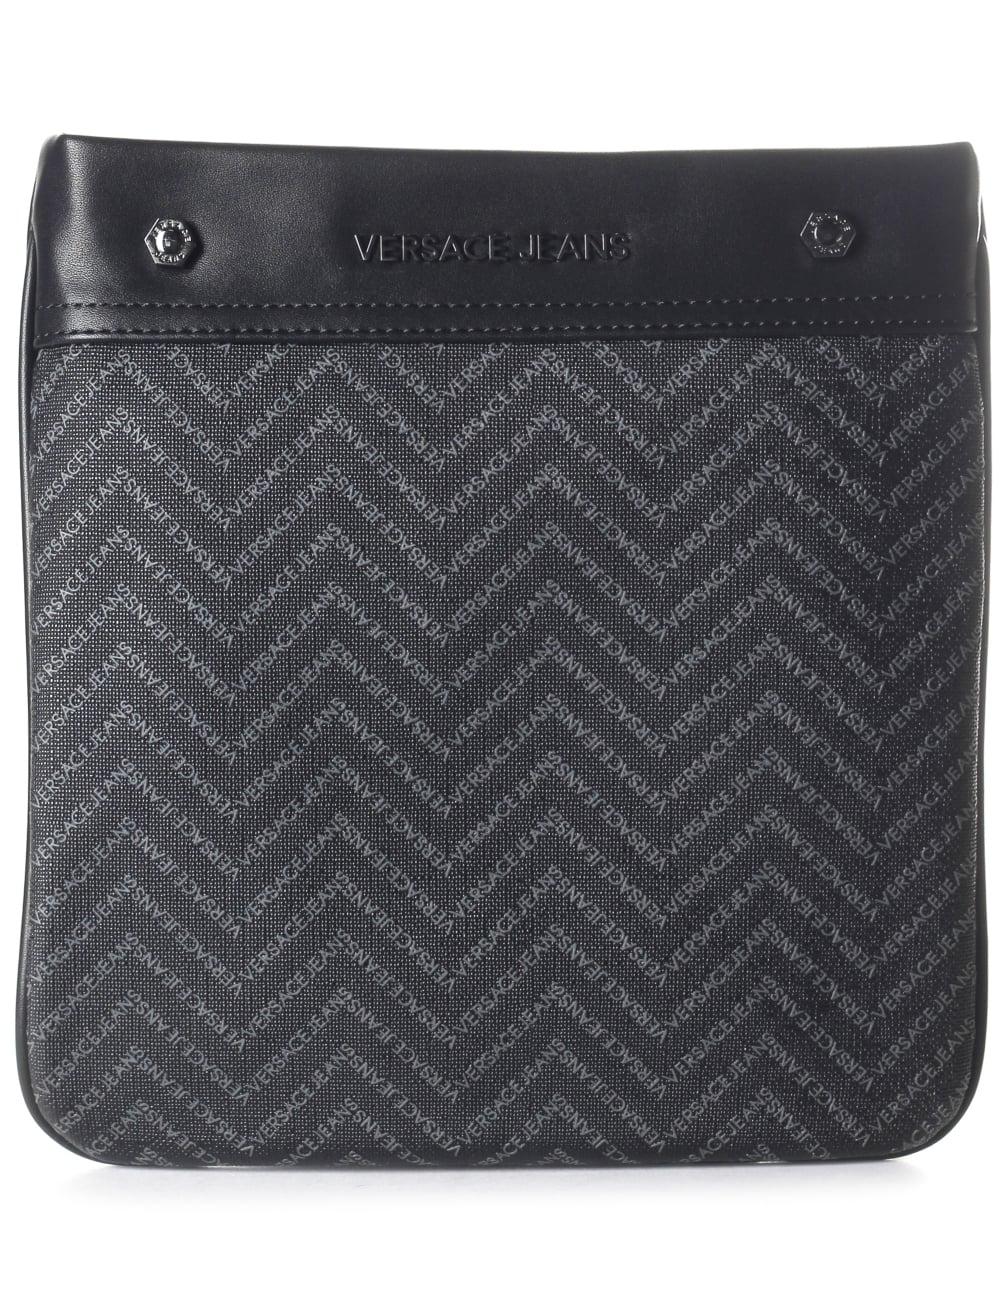 Versace Jeans Chevron Print Men s Satchel Bag Black 305b0cae8d